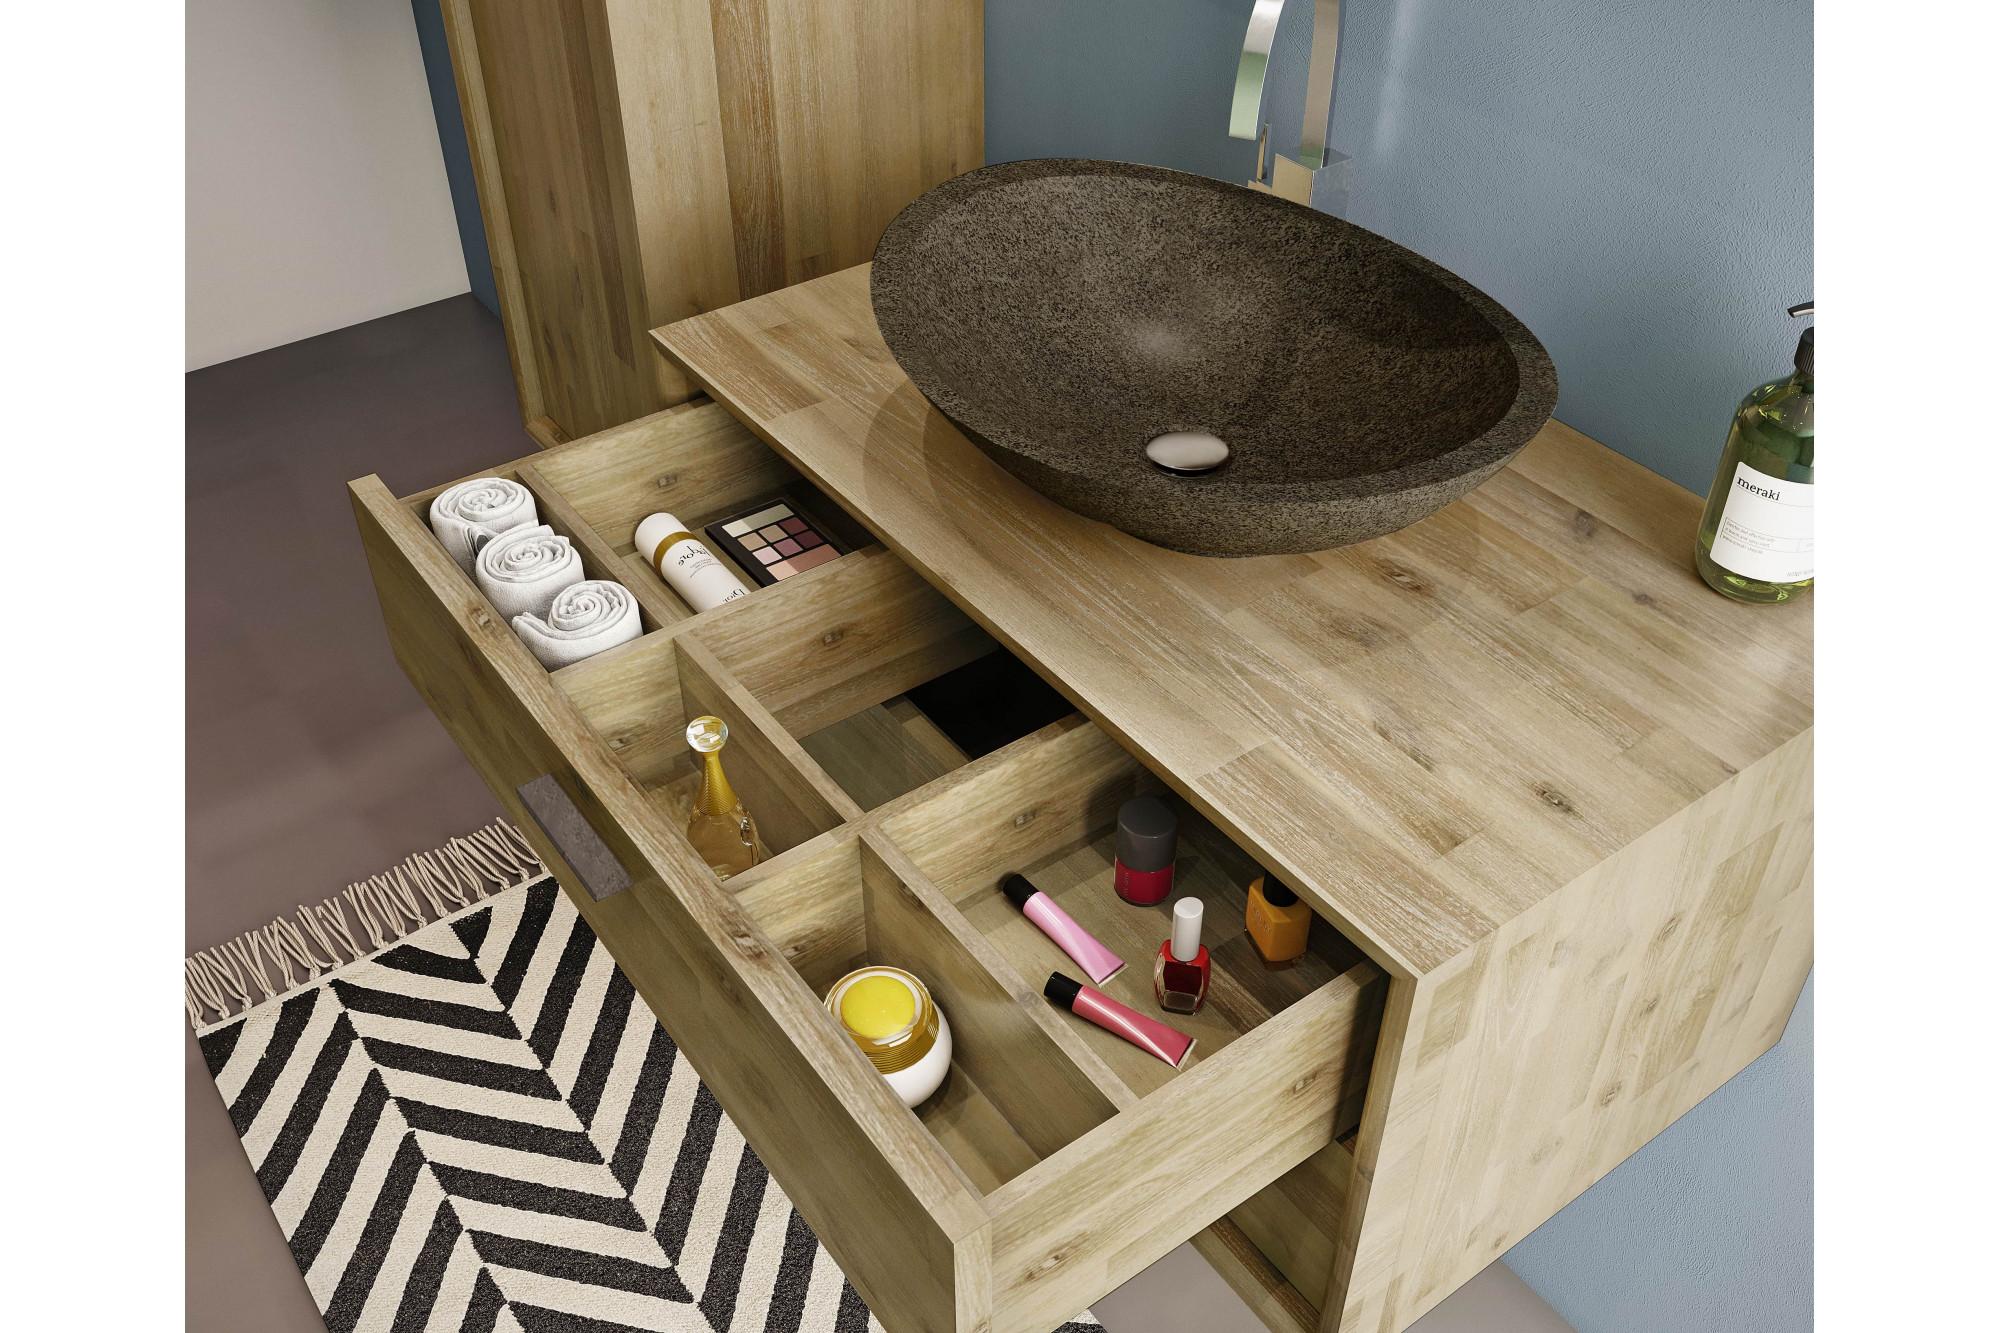 Salle De Bain Avec Bois meuble de salle de bain en bois 80 cm - vasque en pierre - ensemble fuji